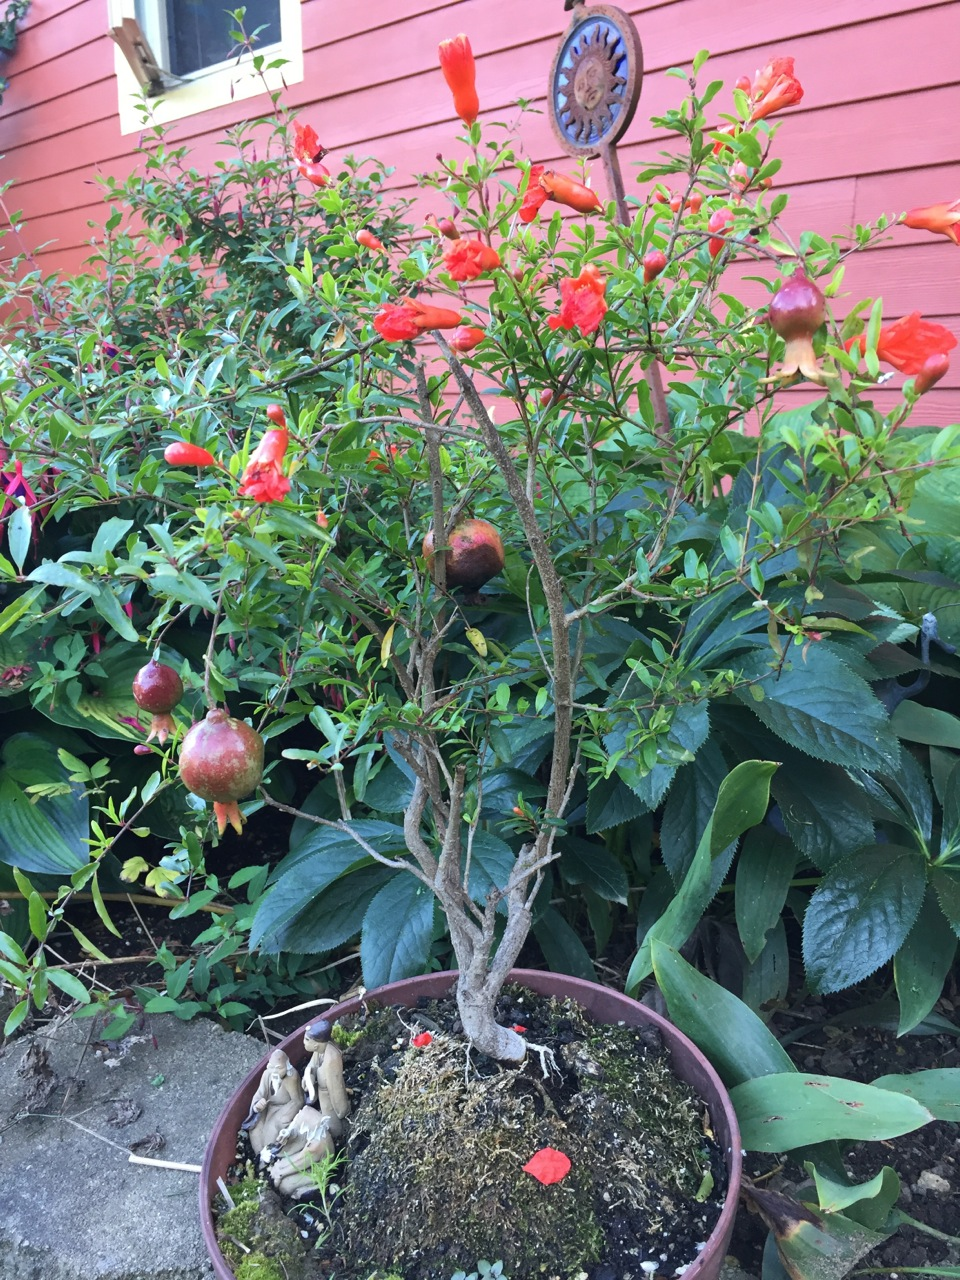 Julie Zickefoose on Blogspot: August Rocks: Garden Tour 1